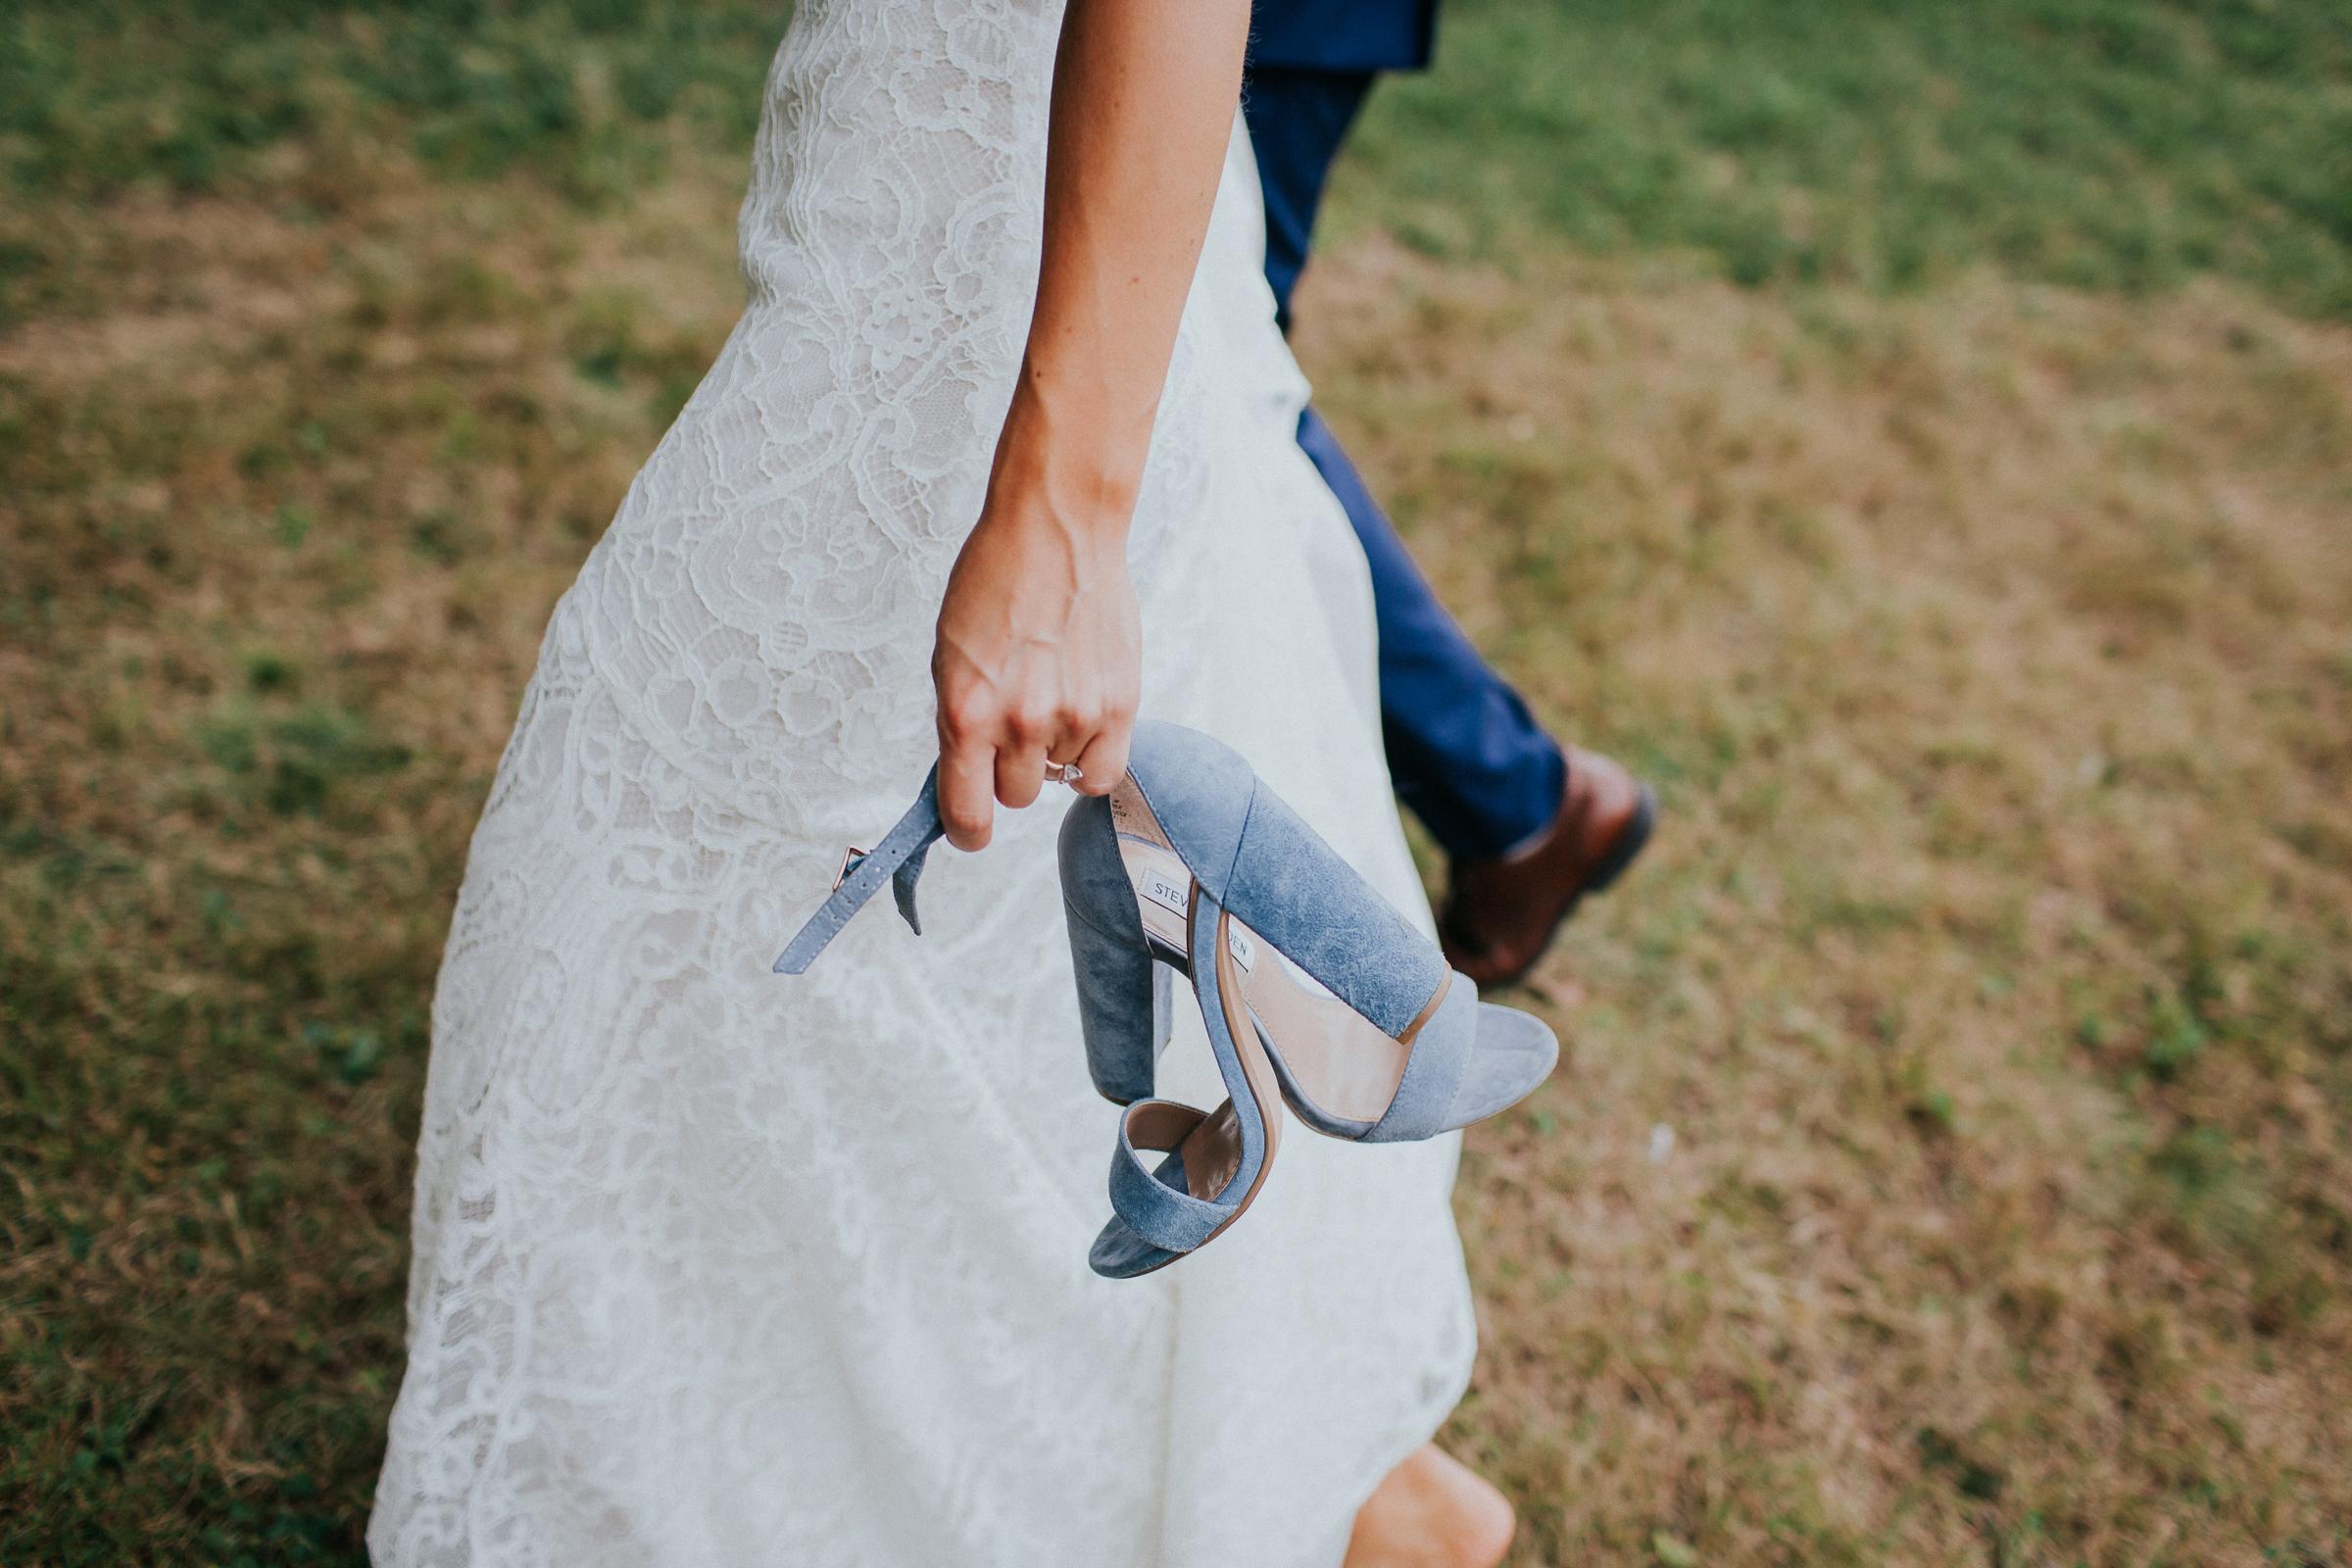 Marianmade-Farm-Wiscasset-Maine-Fine-Art-Documentary-Wedding-Photographer-Elvira-Kalviste-Photography-46.jpg